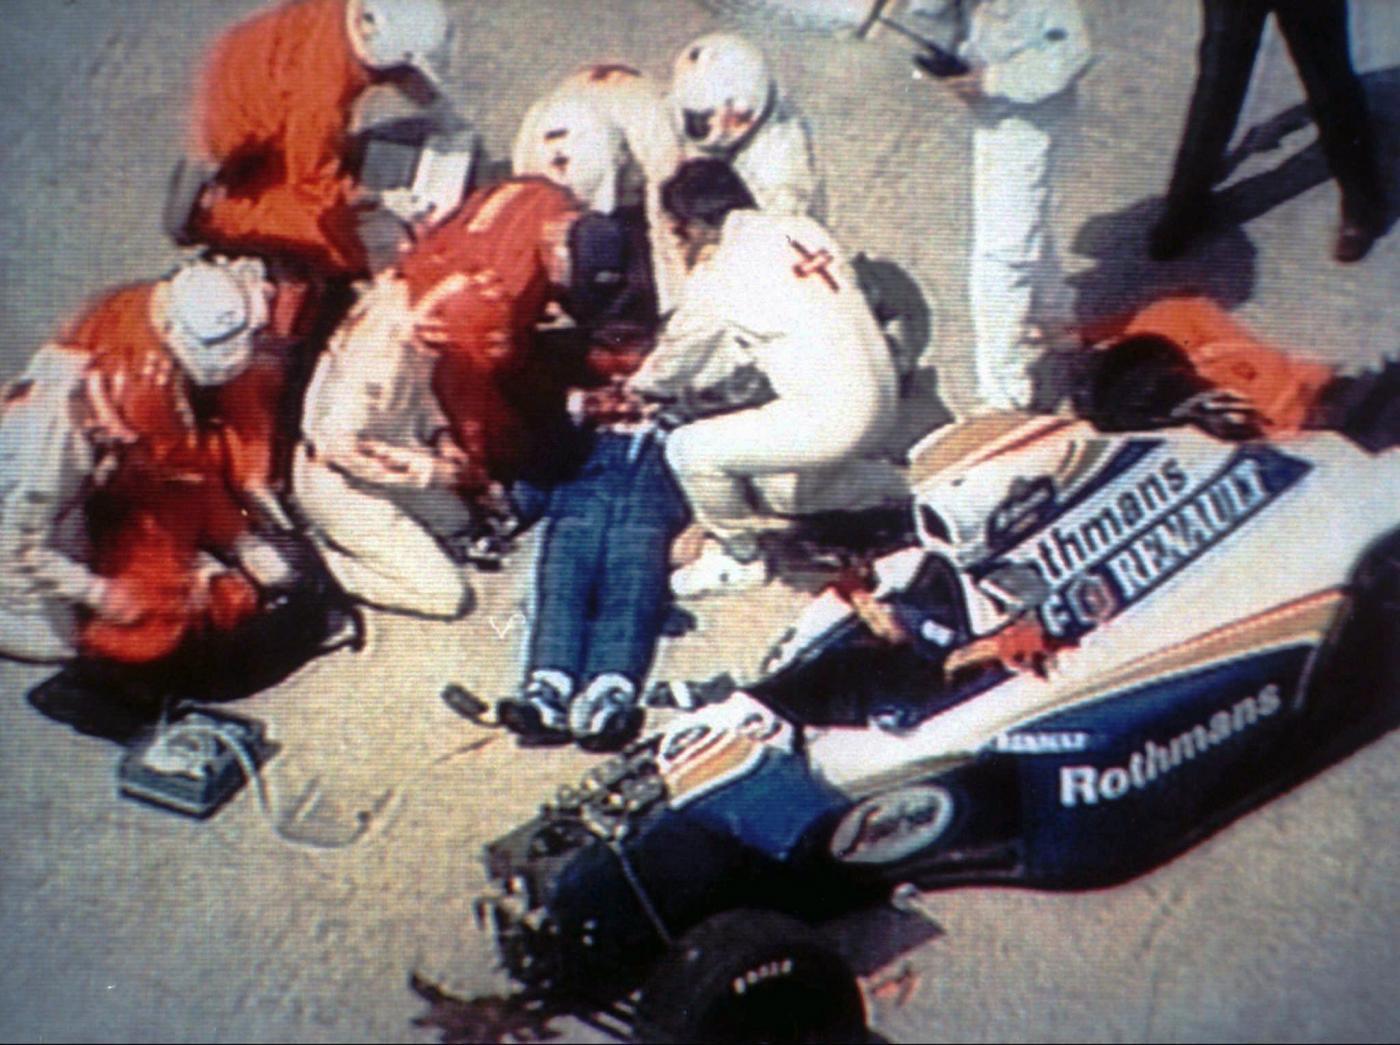 Ayrton Senna: 22 anni dopo la sua tragica morte